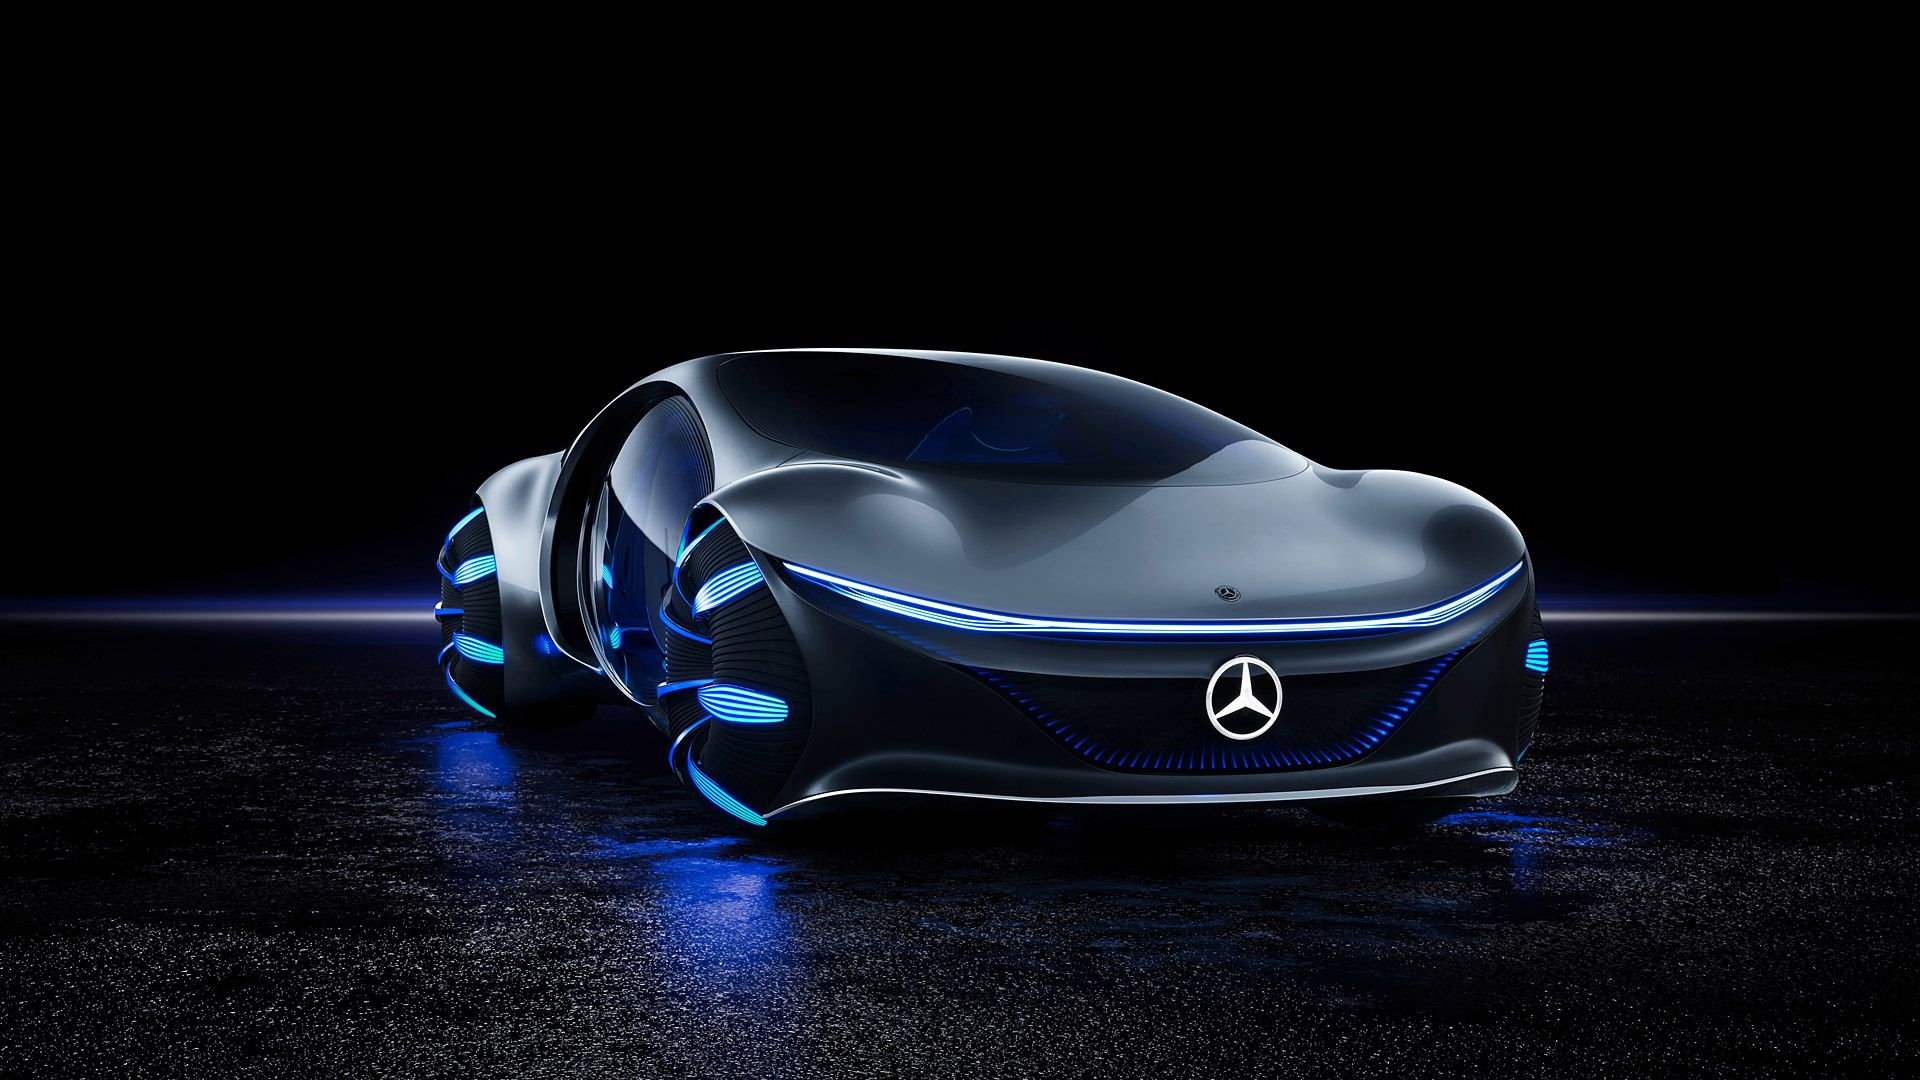 2020 Mercedes Benz Vision Avtr Concept In 2020 Mercedes Benz Concept Cars Mercedes